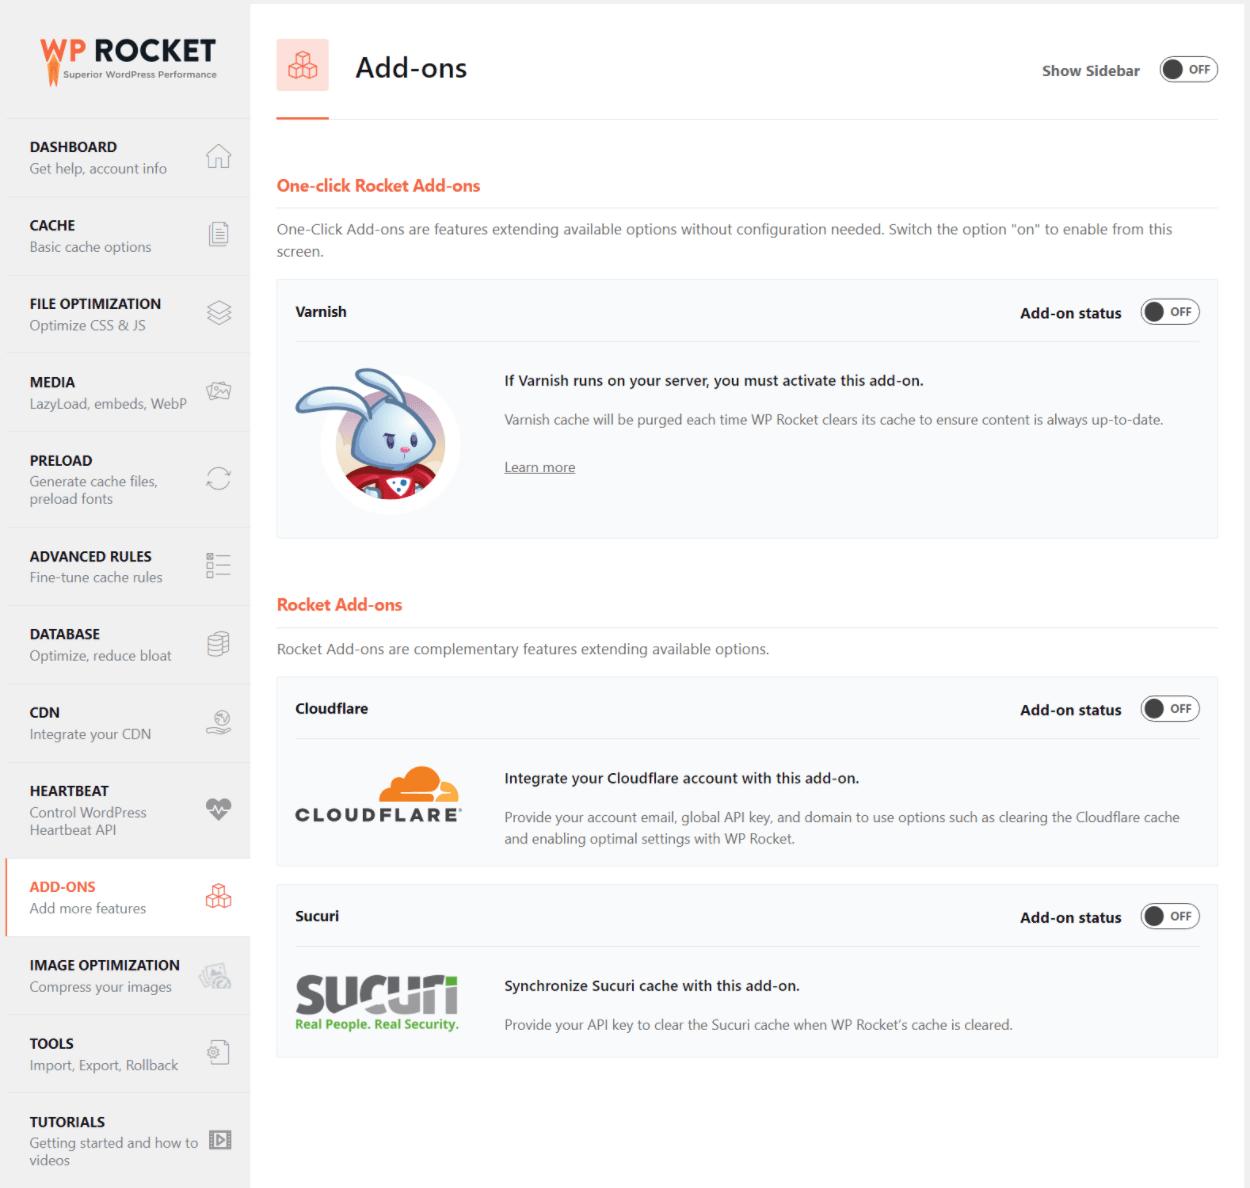 WP Rocket add-ons